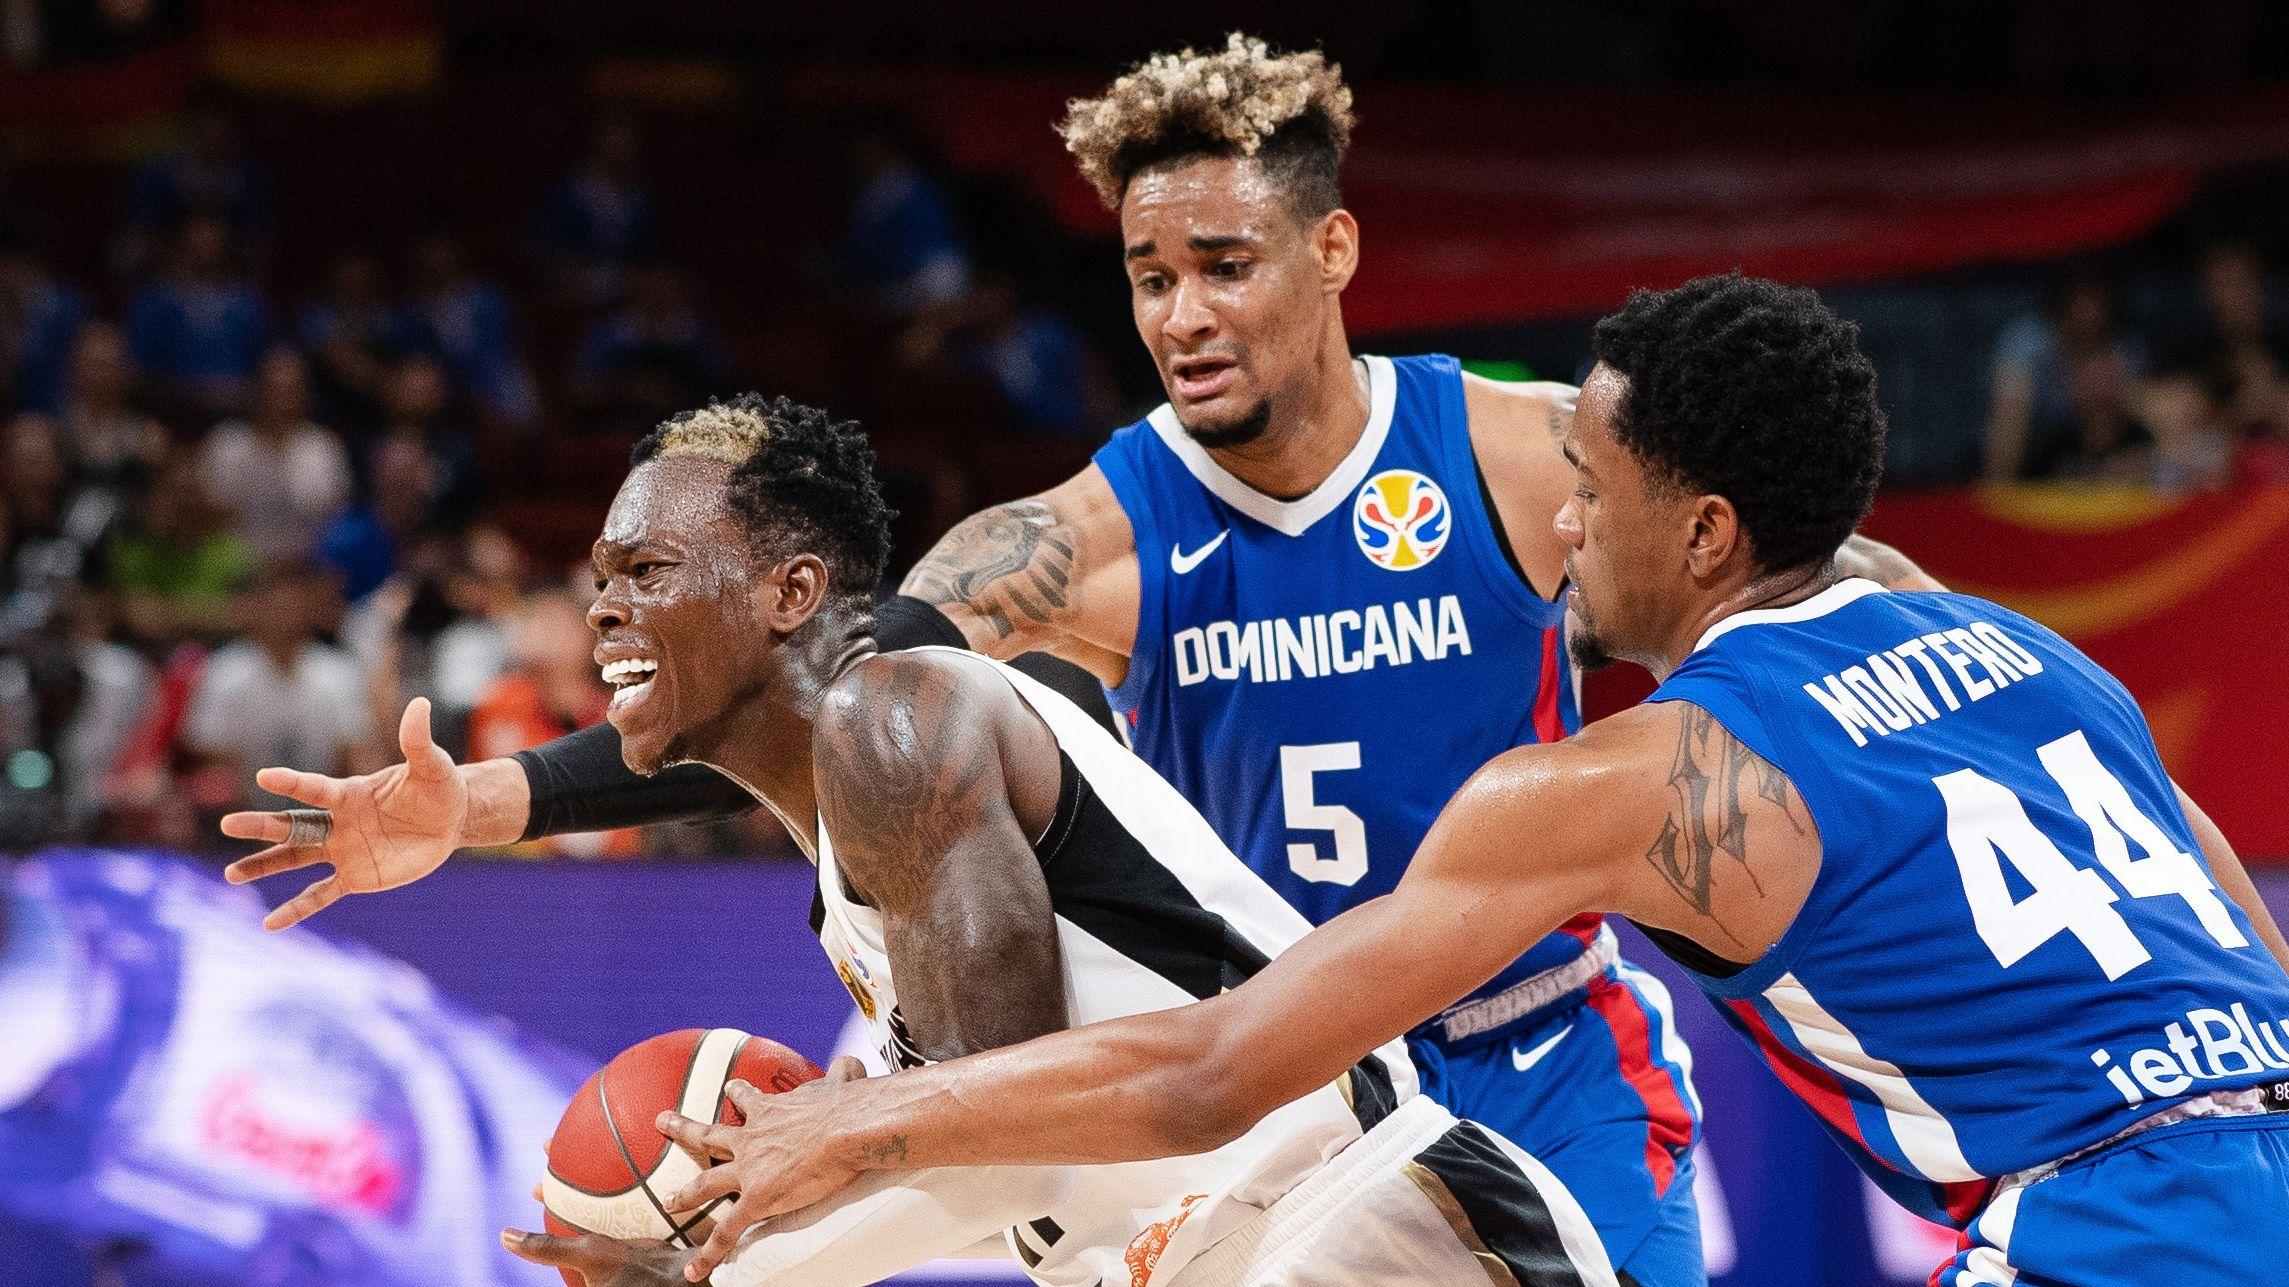 Spielszene Deutschland - Dominikanische Republik